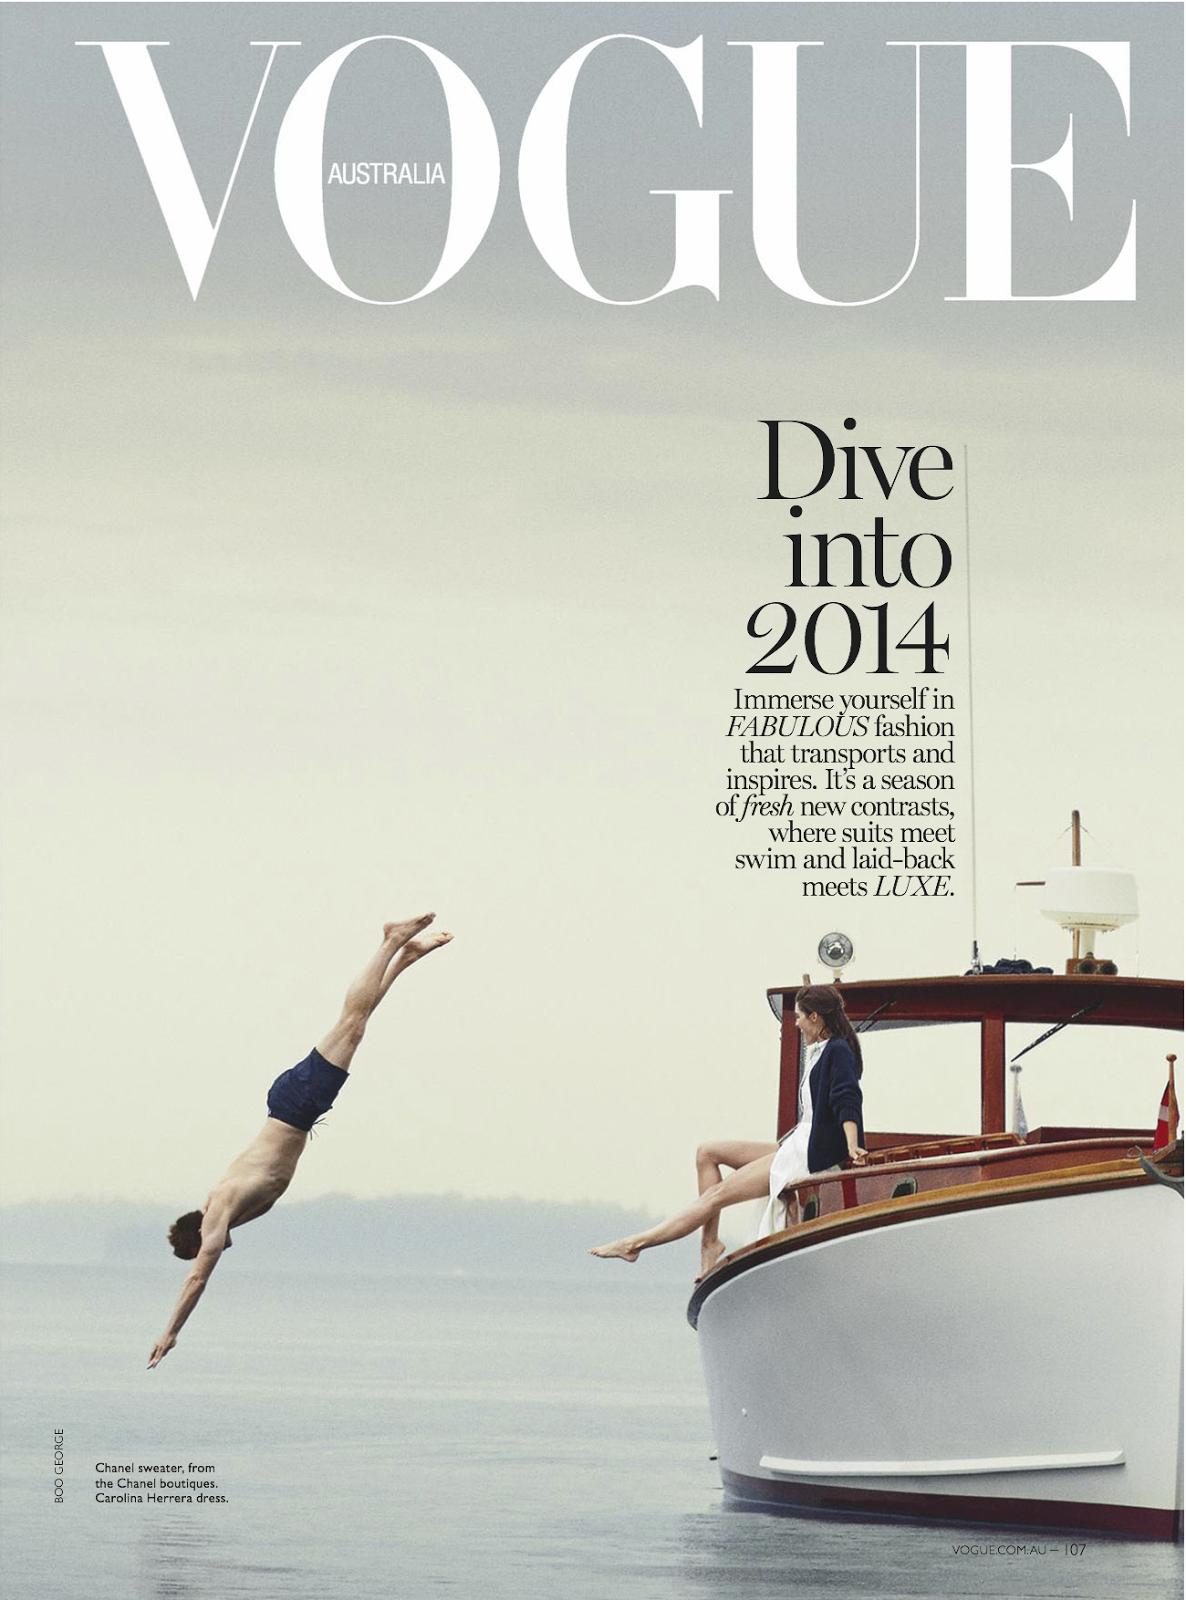 Vogue_Australia_2014_01.bak (dragged) 1.png